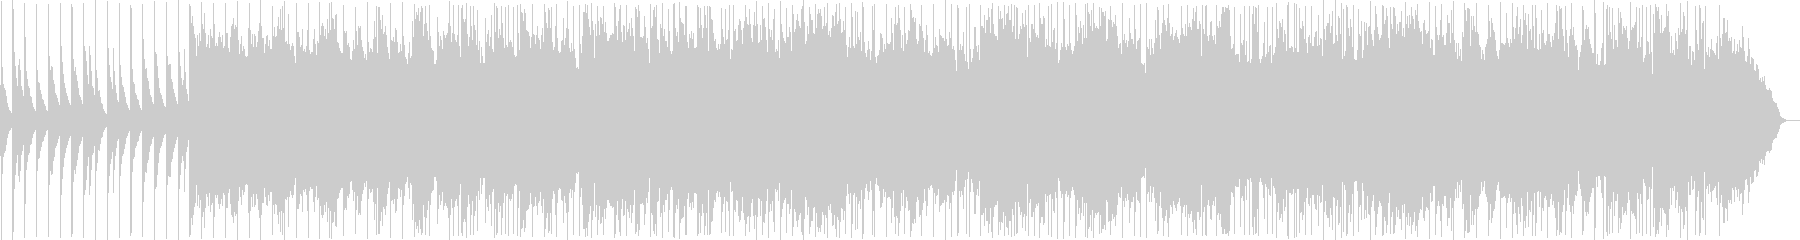 Tingusannu flower / Okinawa folk song's unreproduced waveform